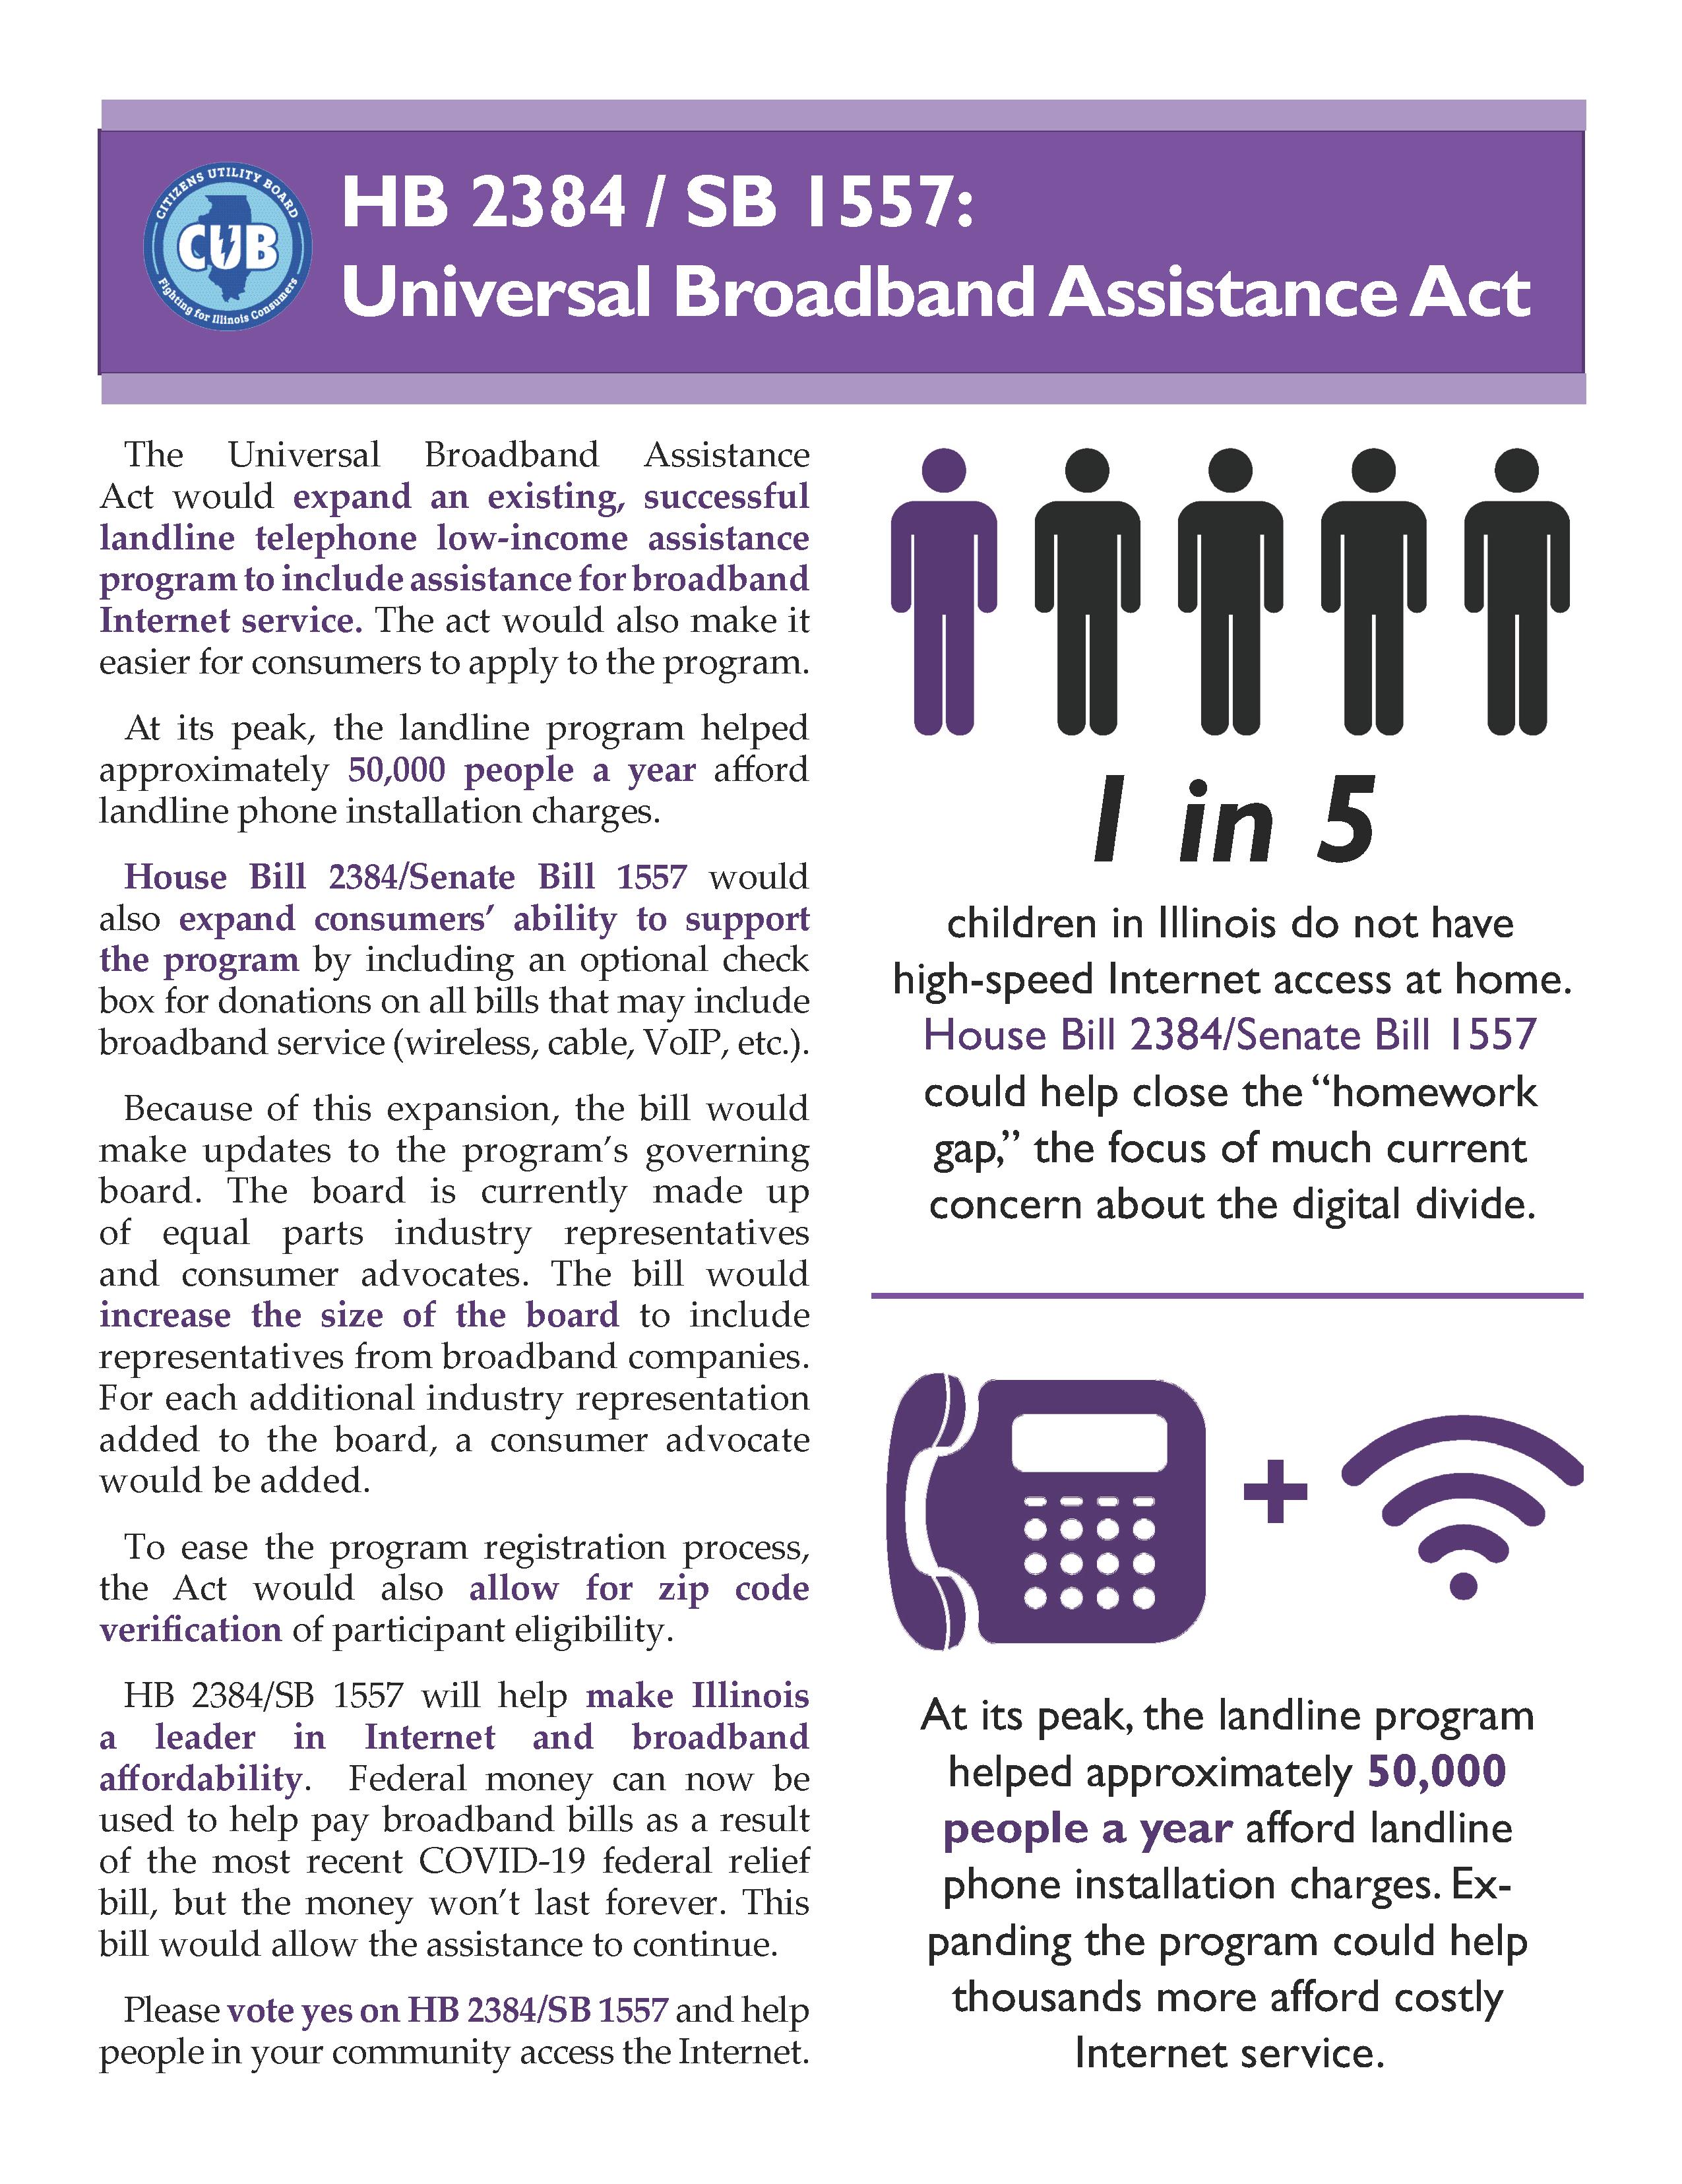 Universal Broadband Assistance Act